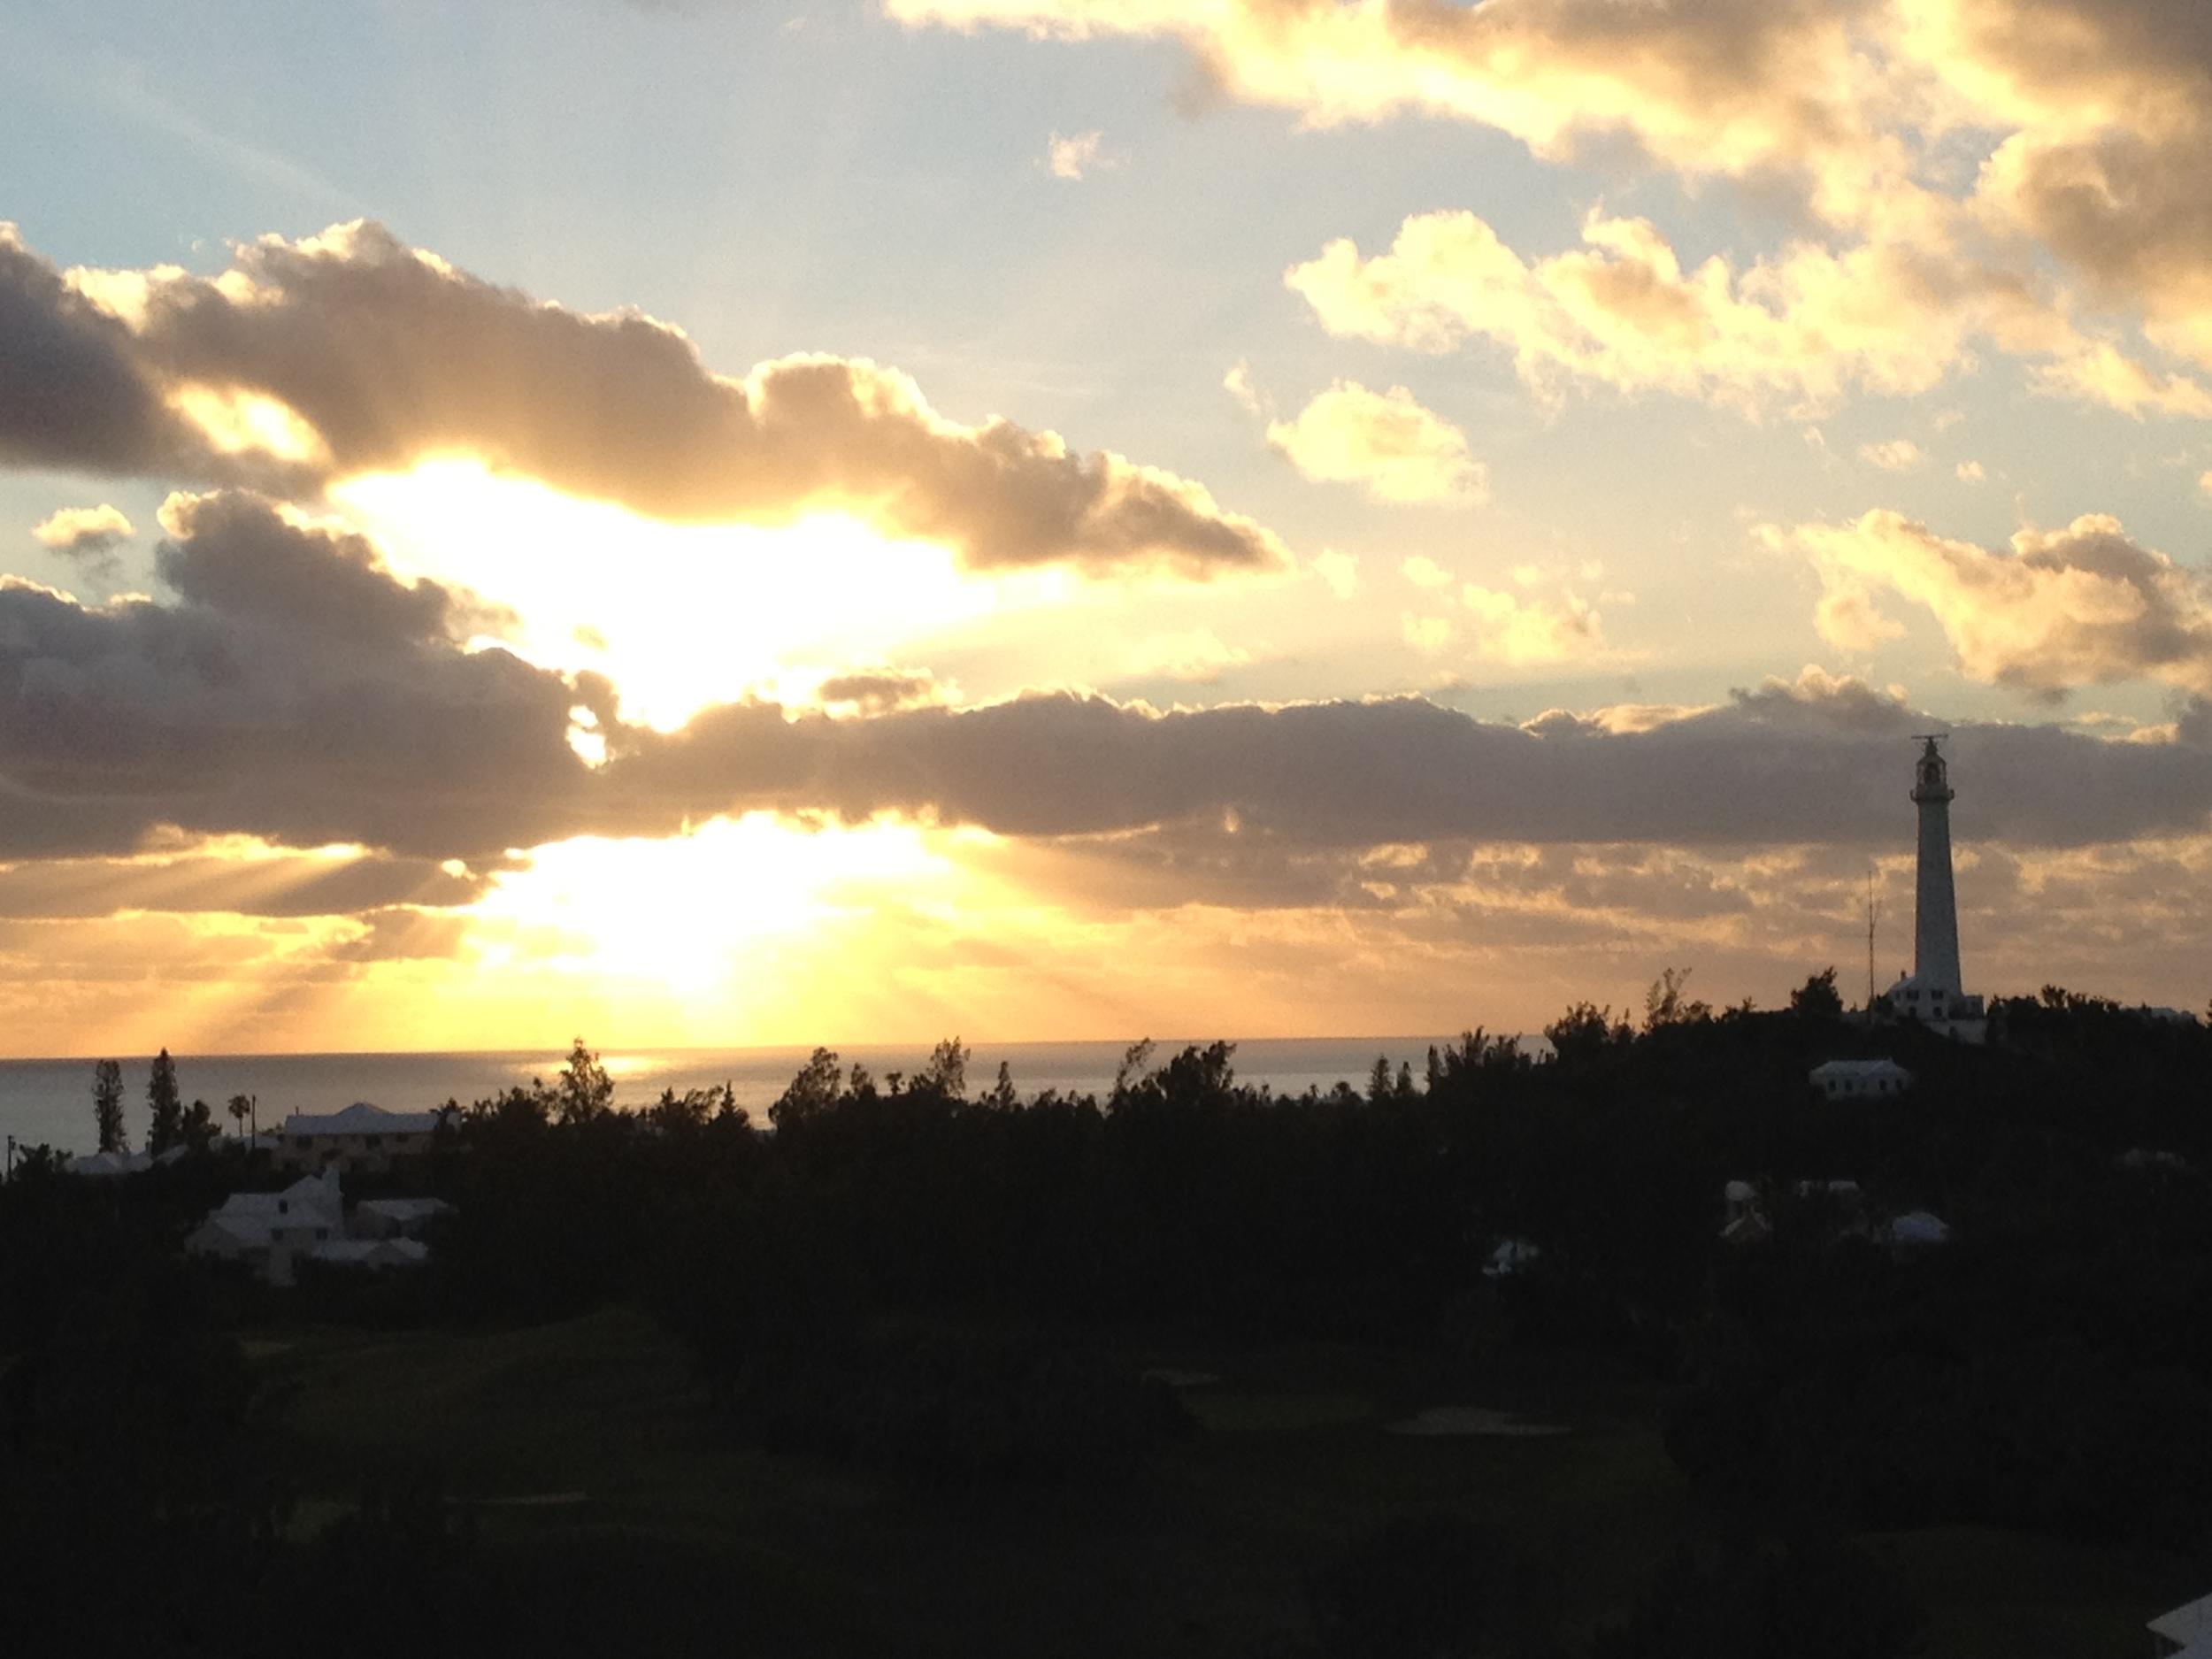 A Gorgeous Sunset - Bermuda 2012